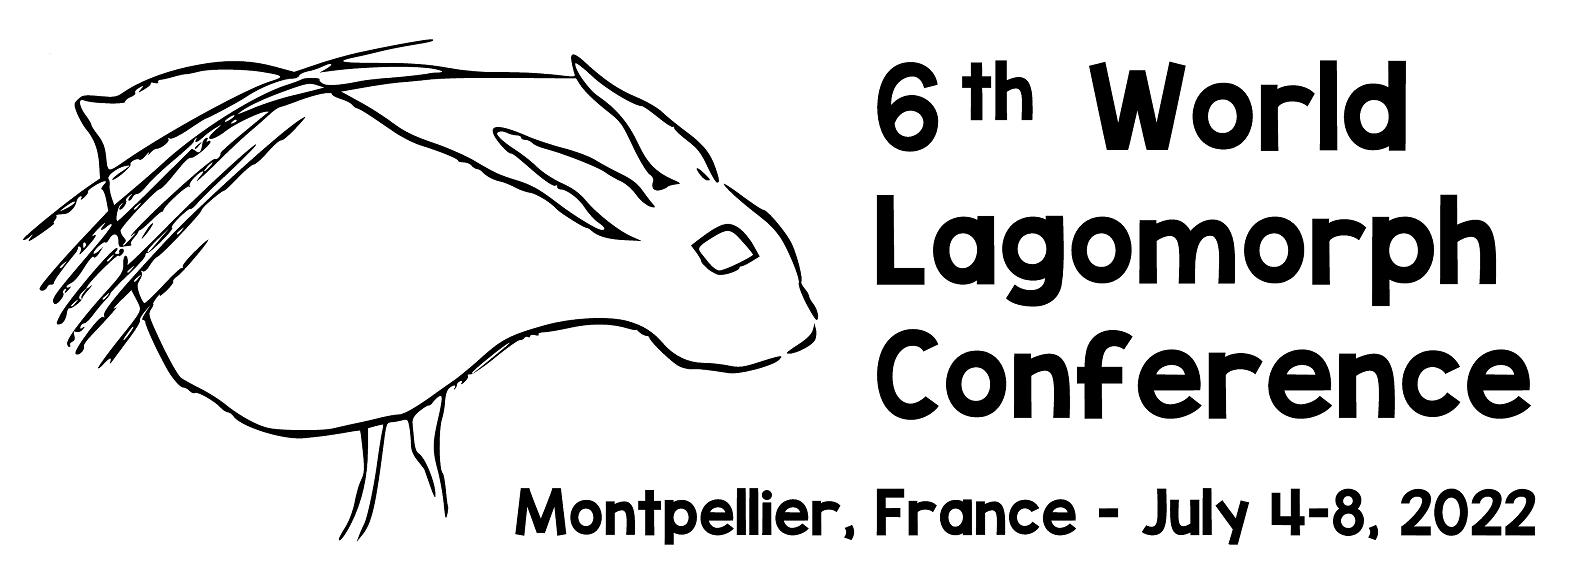 logo WLC6 2022